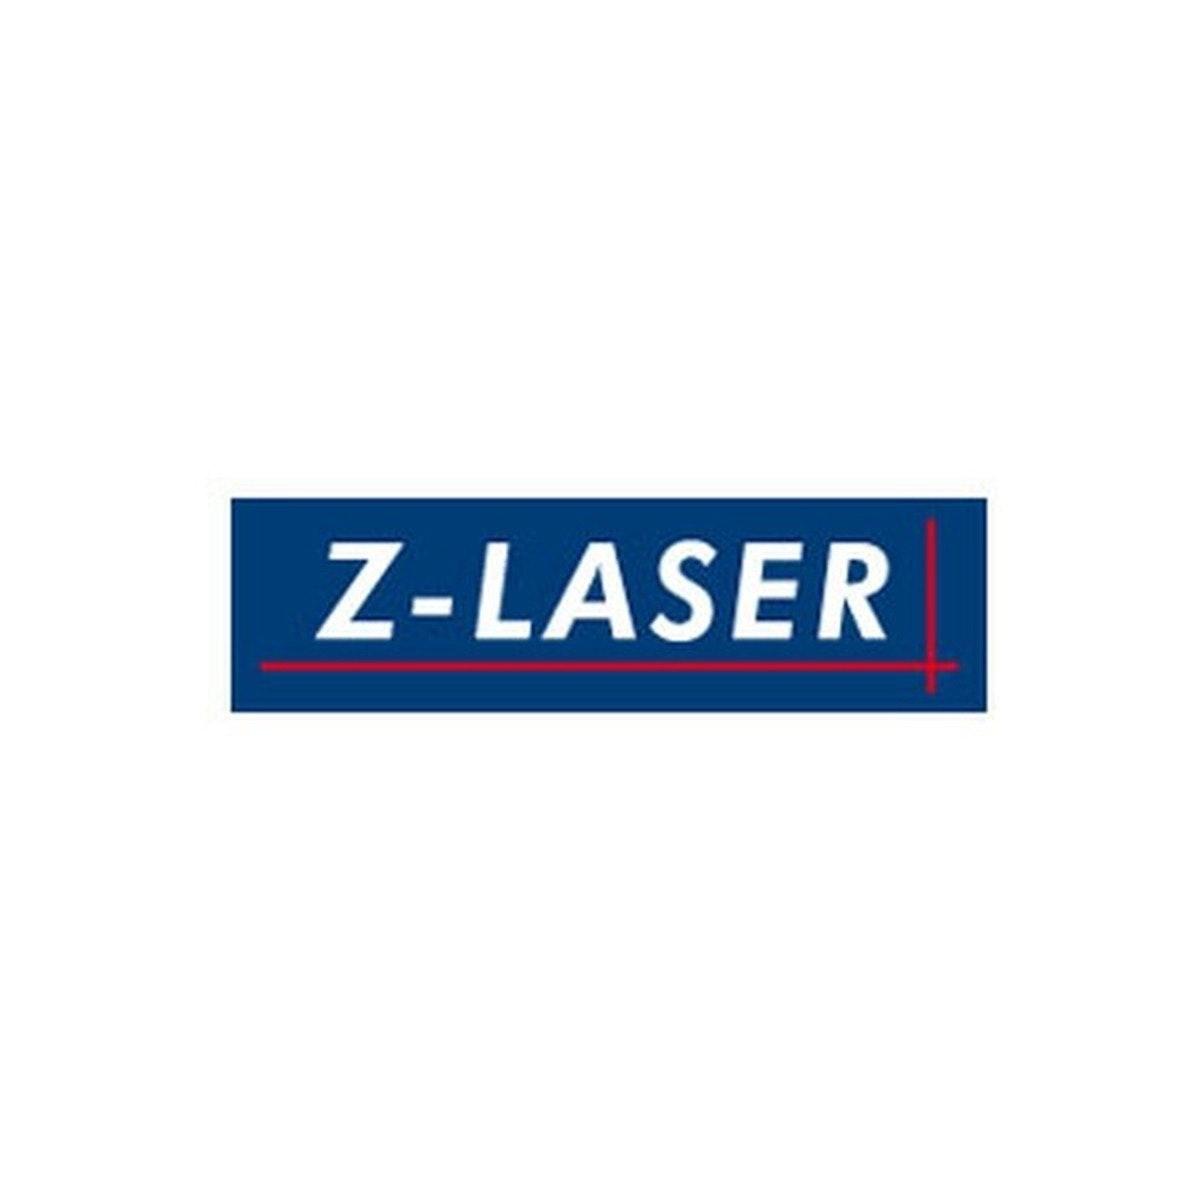 Z-LASER Optoelektronik GmbH